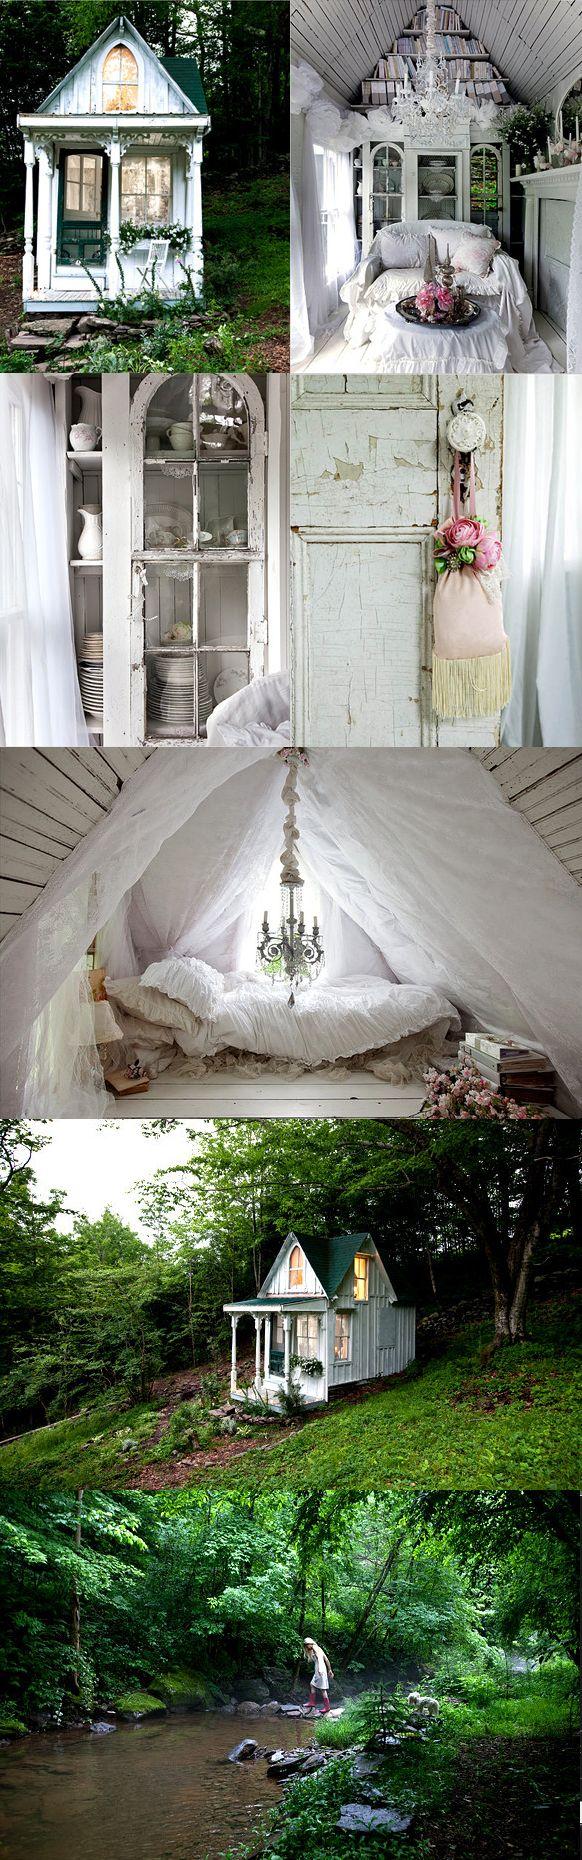 best utiny houses u tree housesu images on pinterest my house